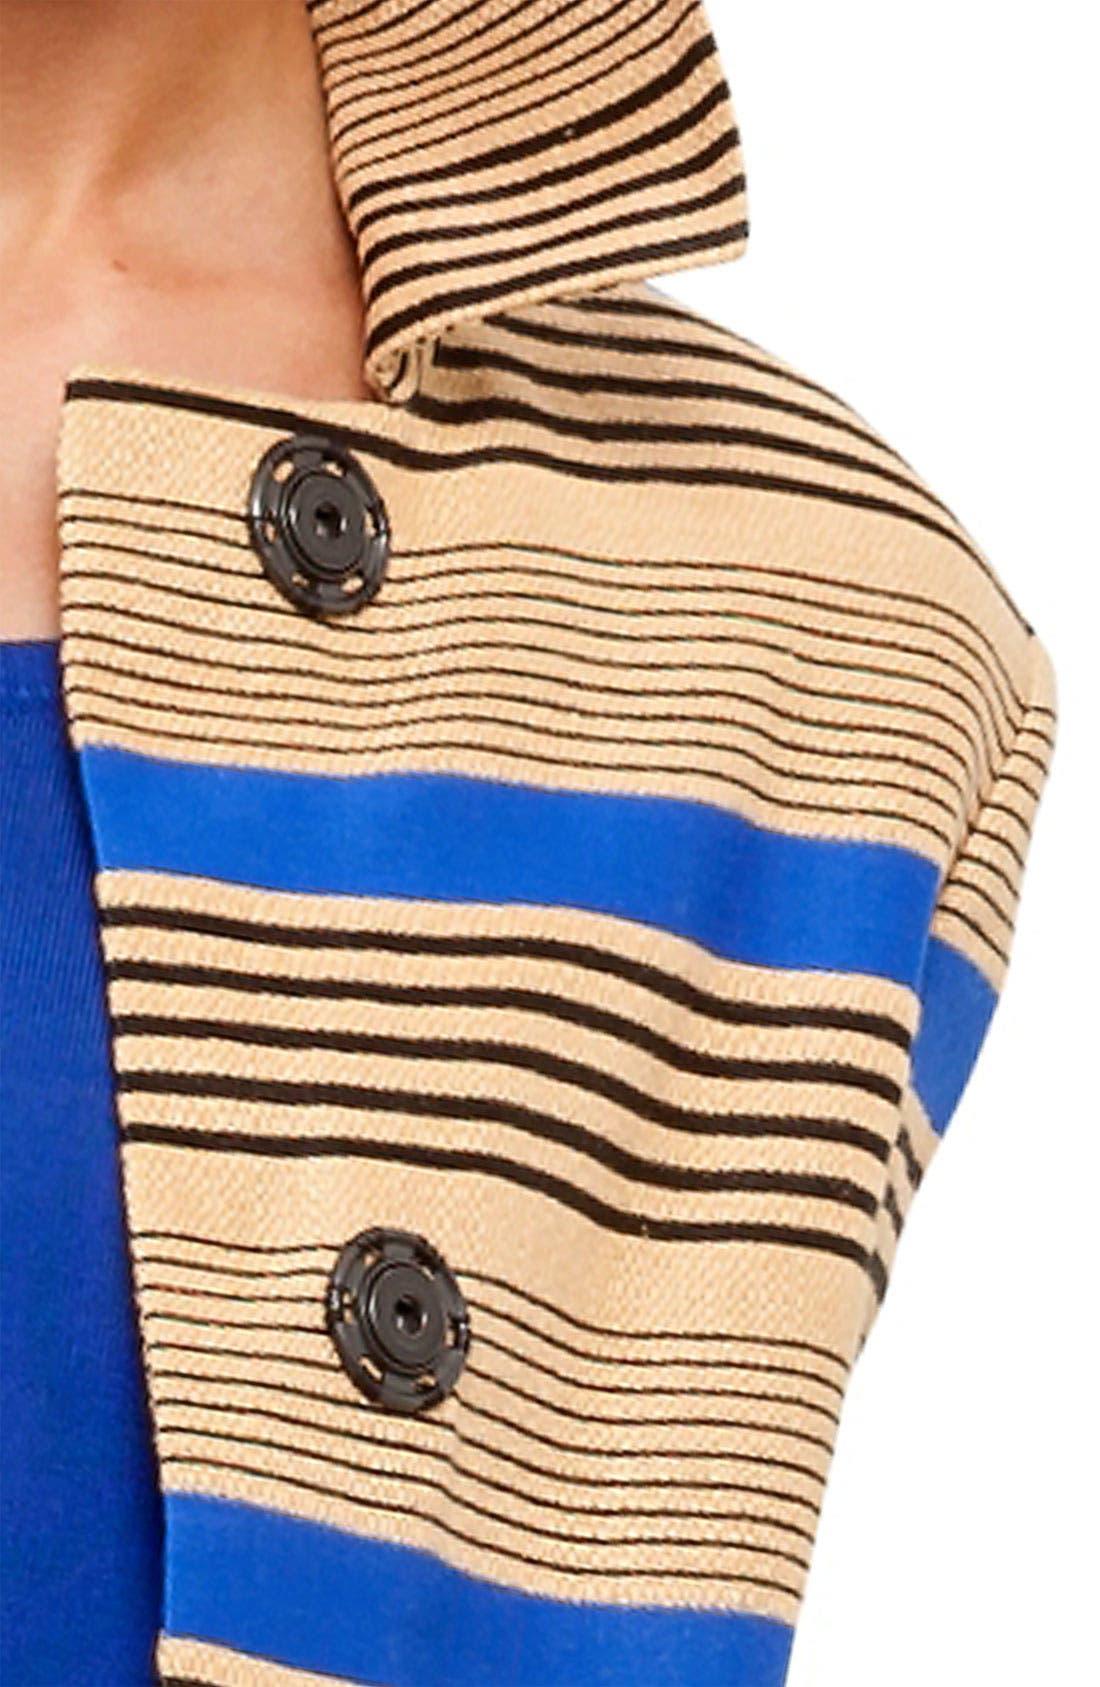 Stripe Linen Blend Jacket,                             Alternate thumbnail 2, color,                             701